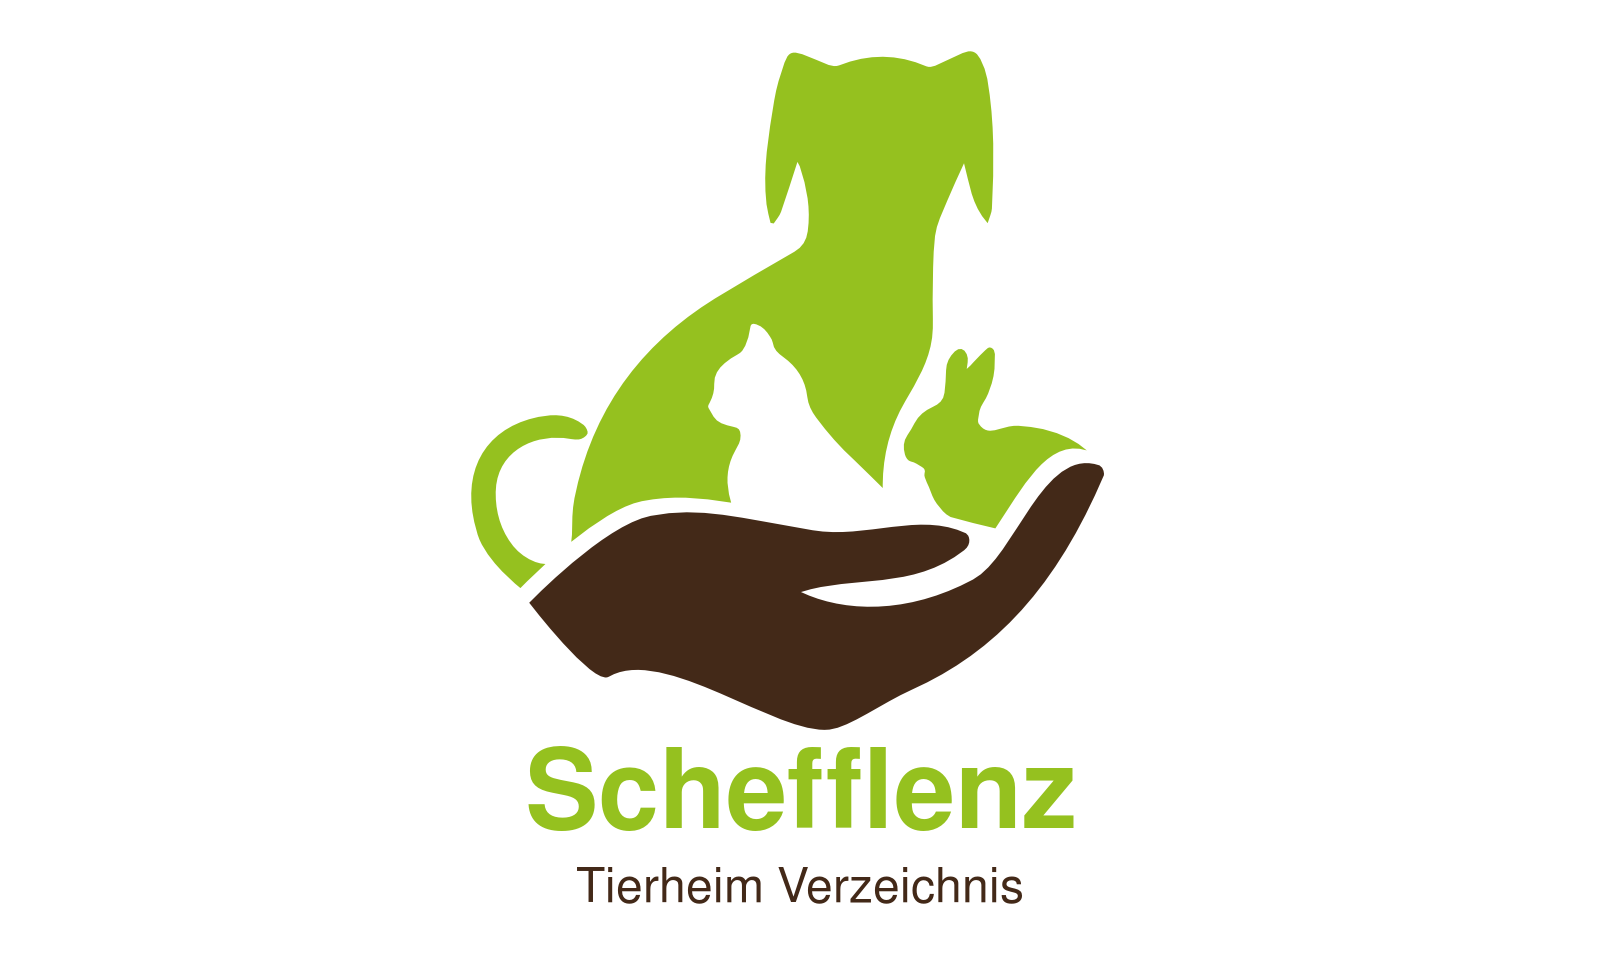 Tierheim Schefflenz